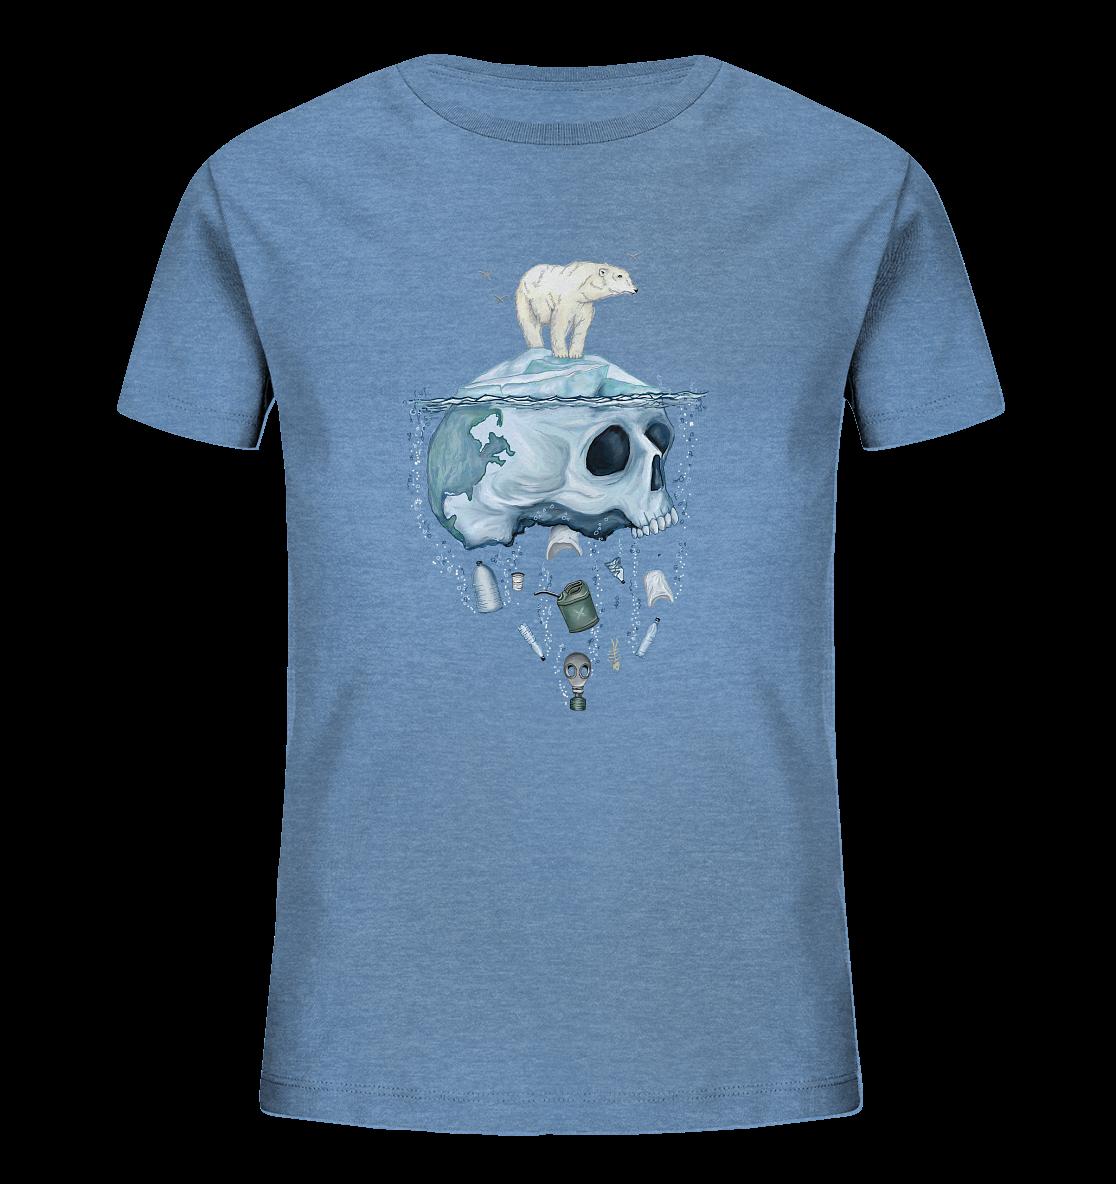 front-kids-organic-shirt-6090c4-1116x-3.png